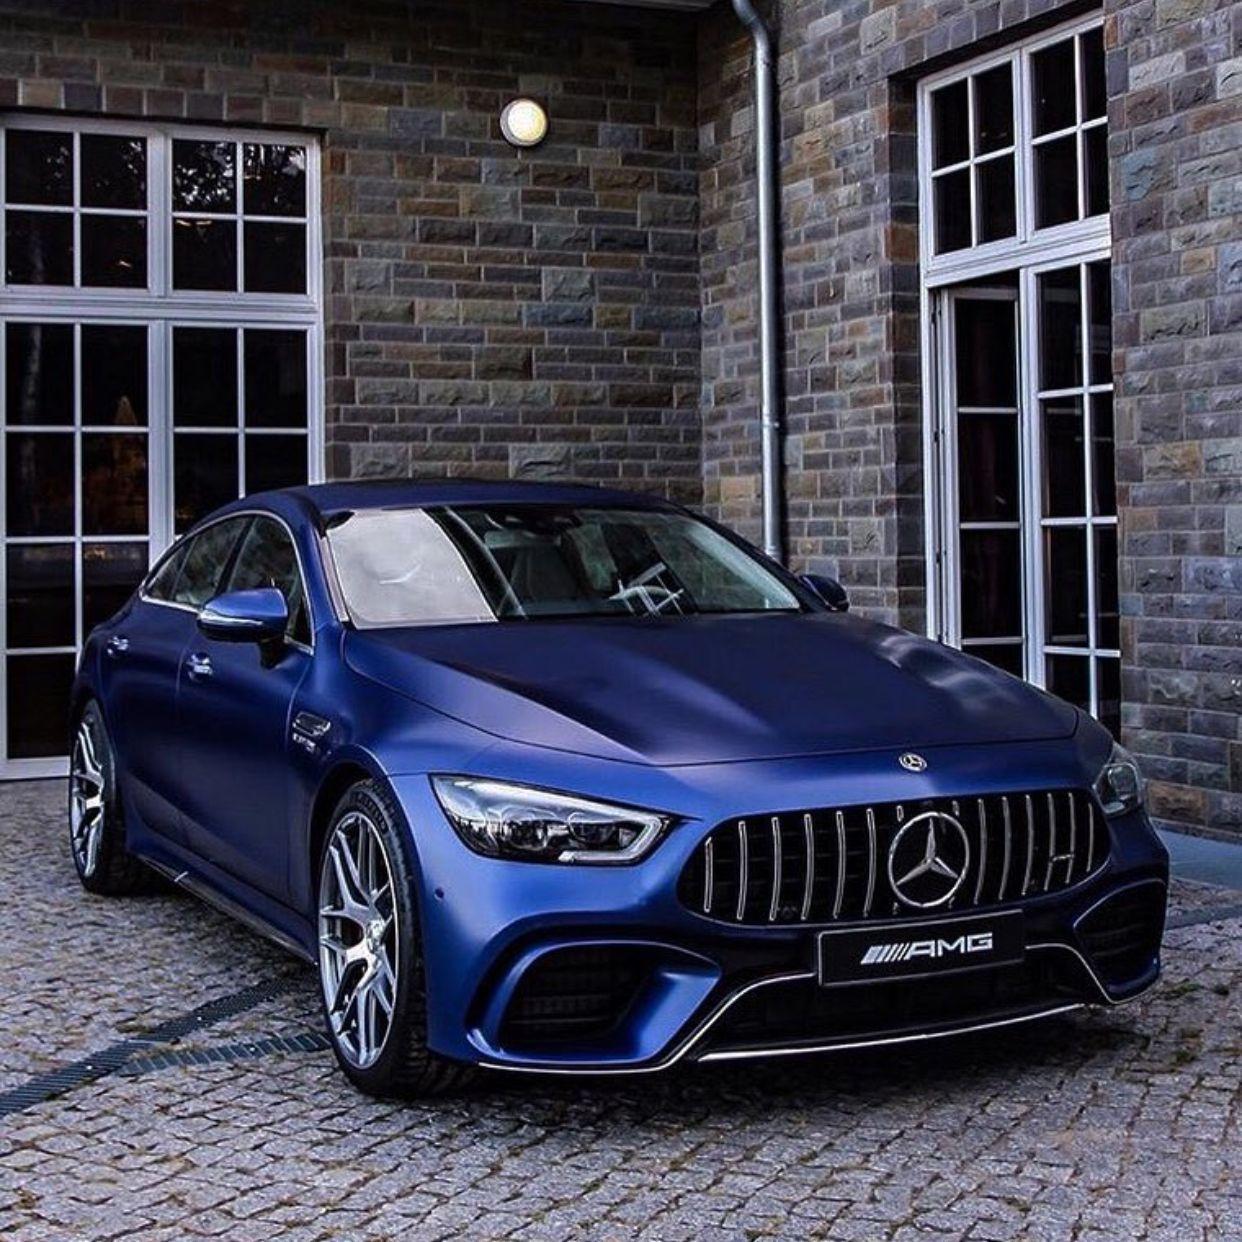 Blue Mercedes Amg Mercedes Amg Mercedes Benz Models Mercedes Benz Cars